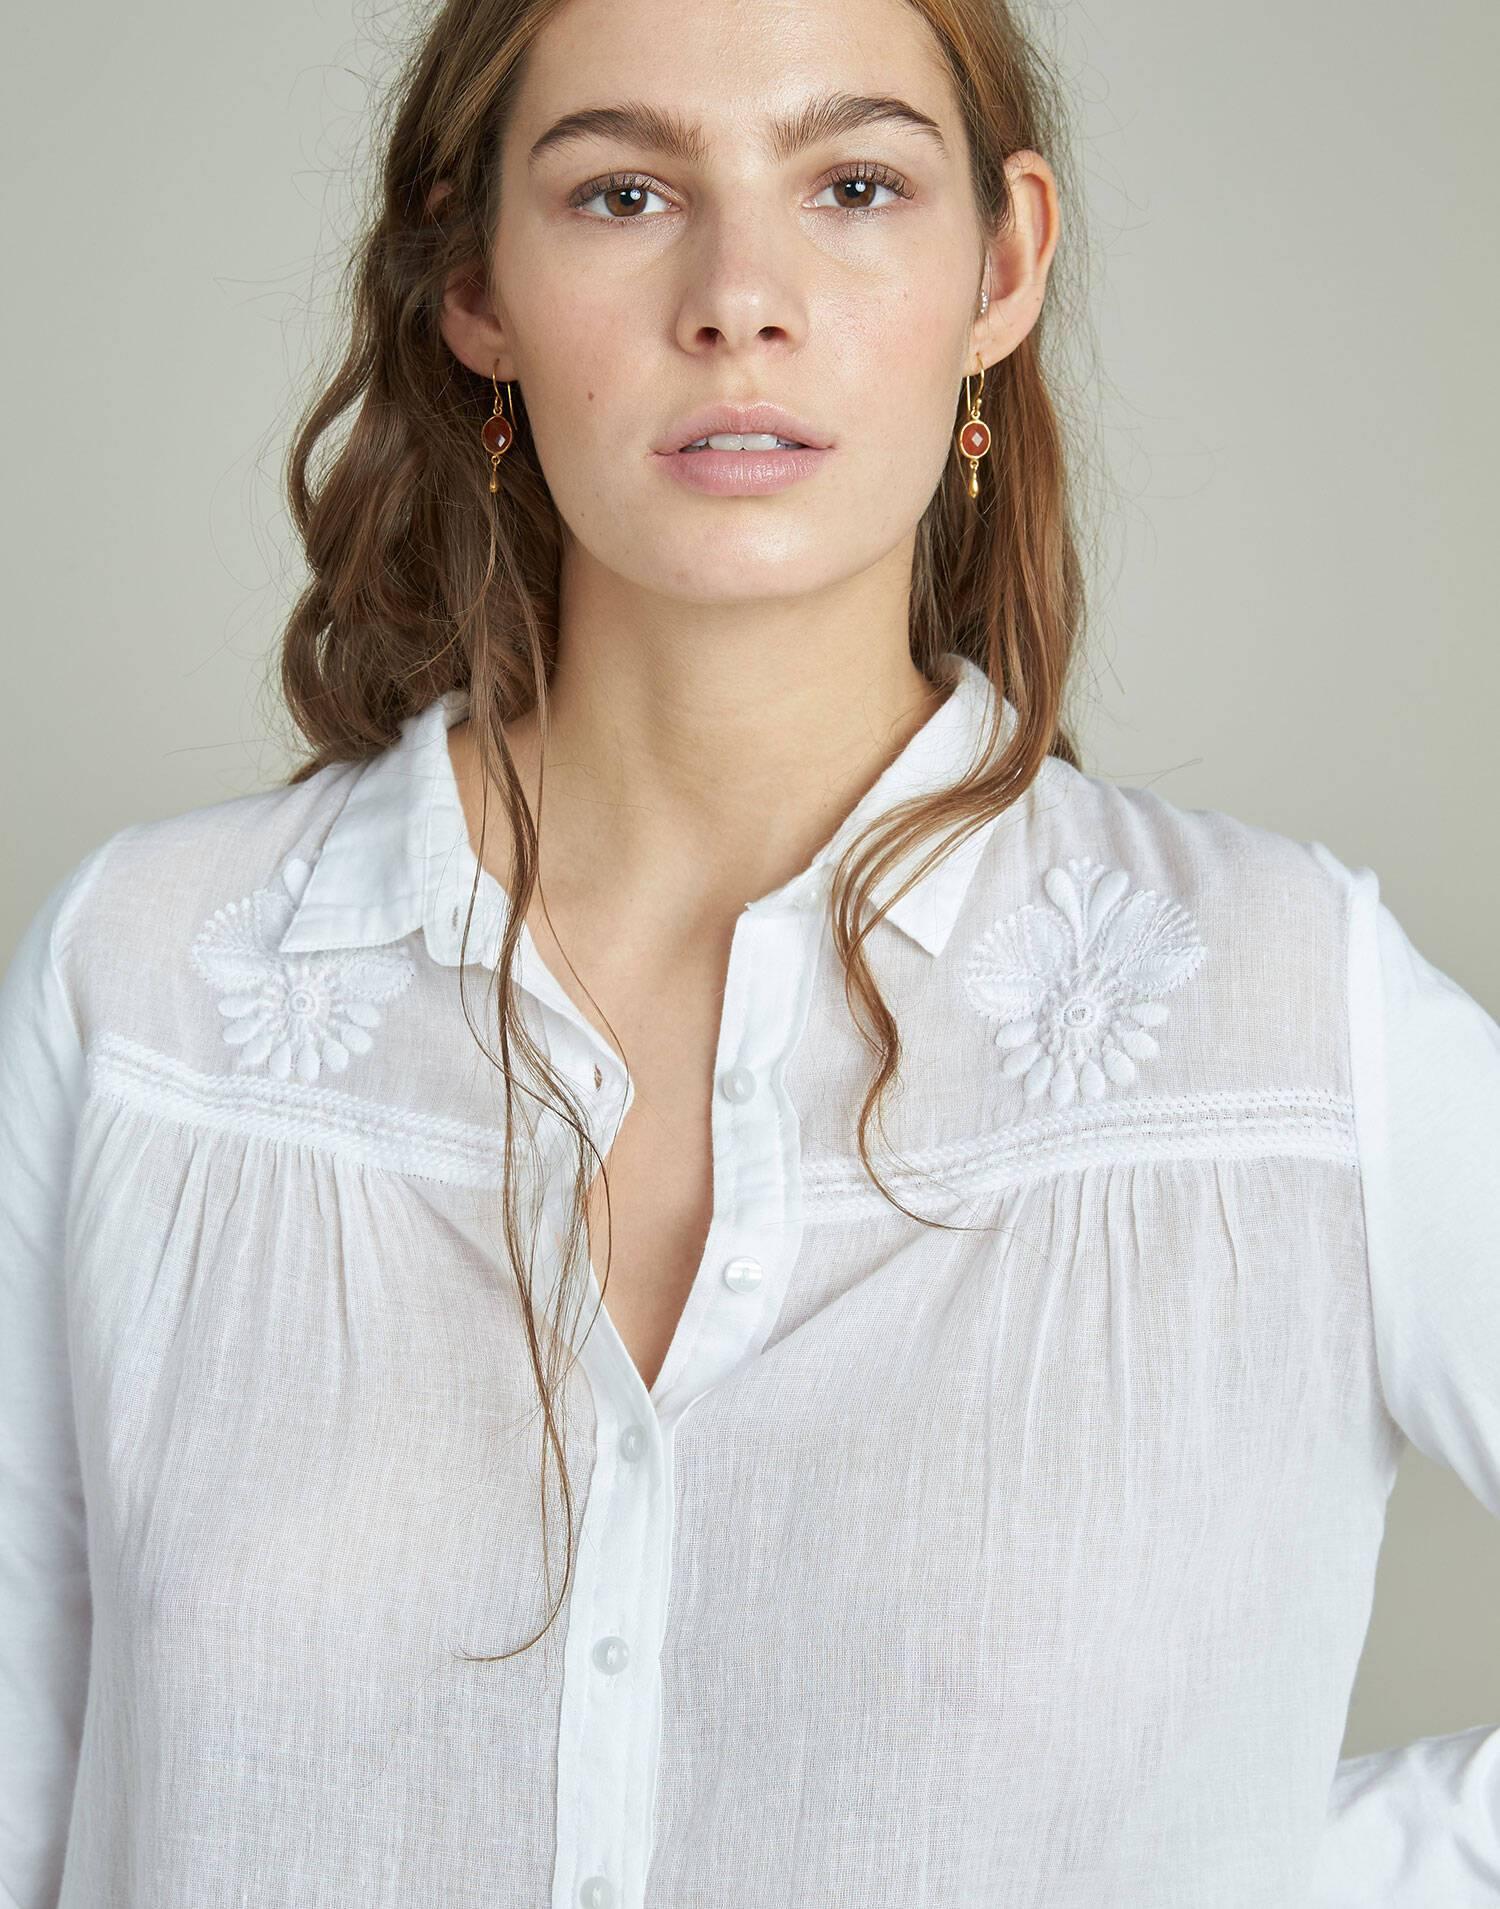 Camisa manga larga dos tejidos bordado